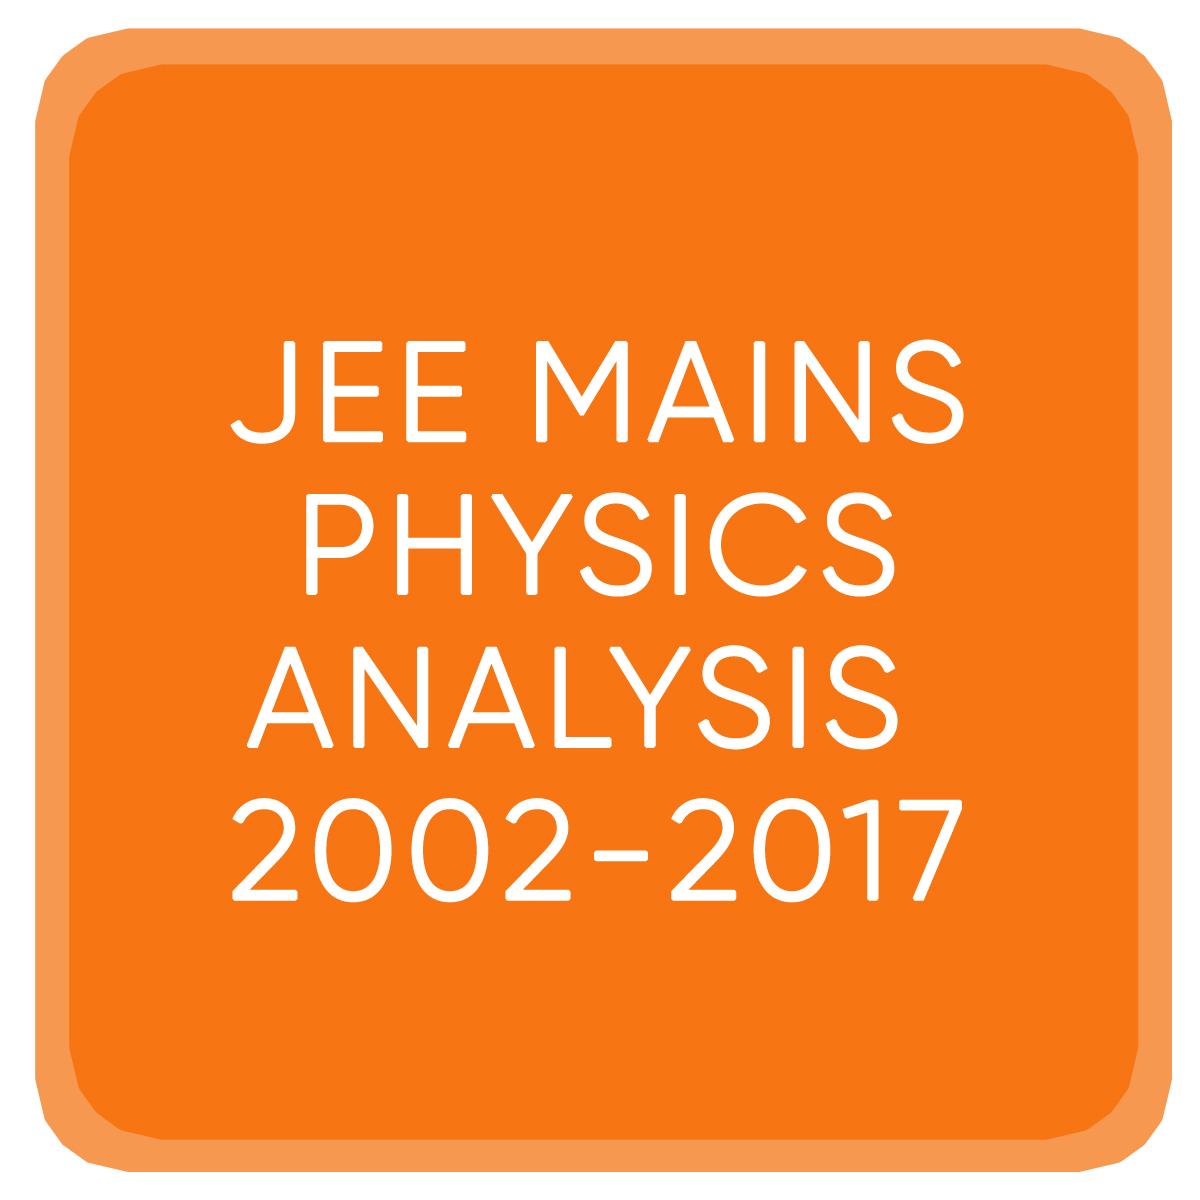 JEE MAINS PHYSICS ANALYSIS 2002-2017